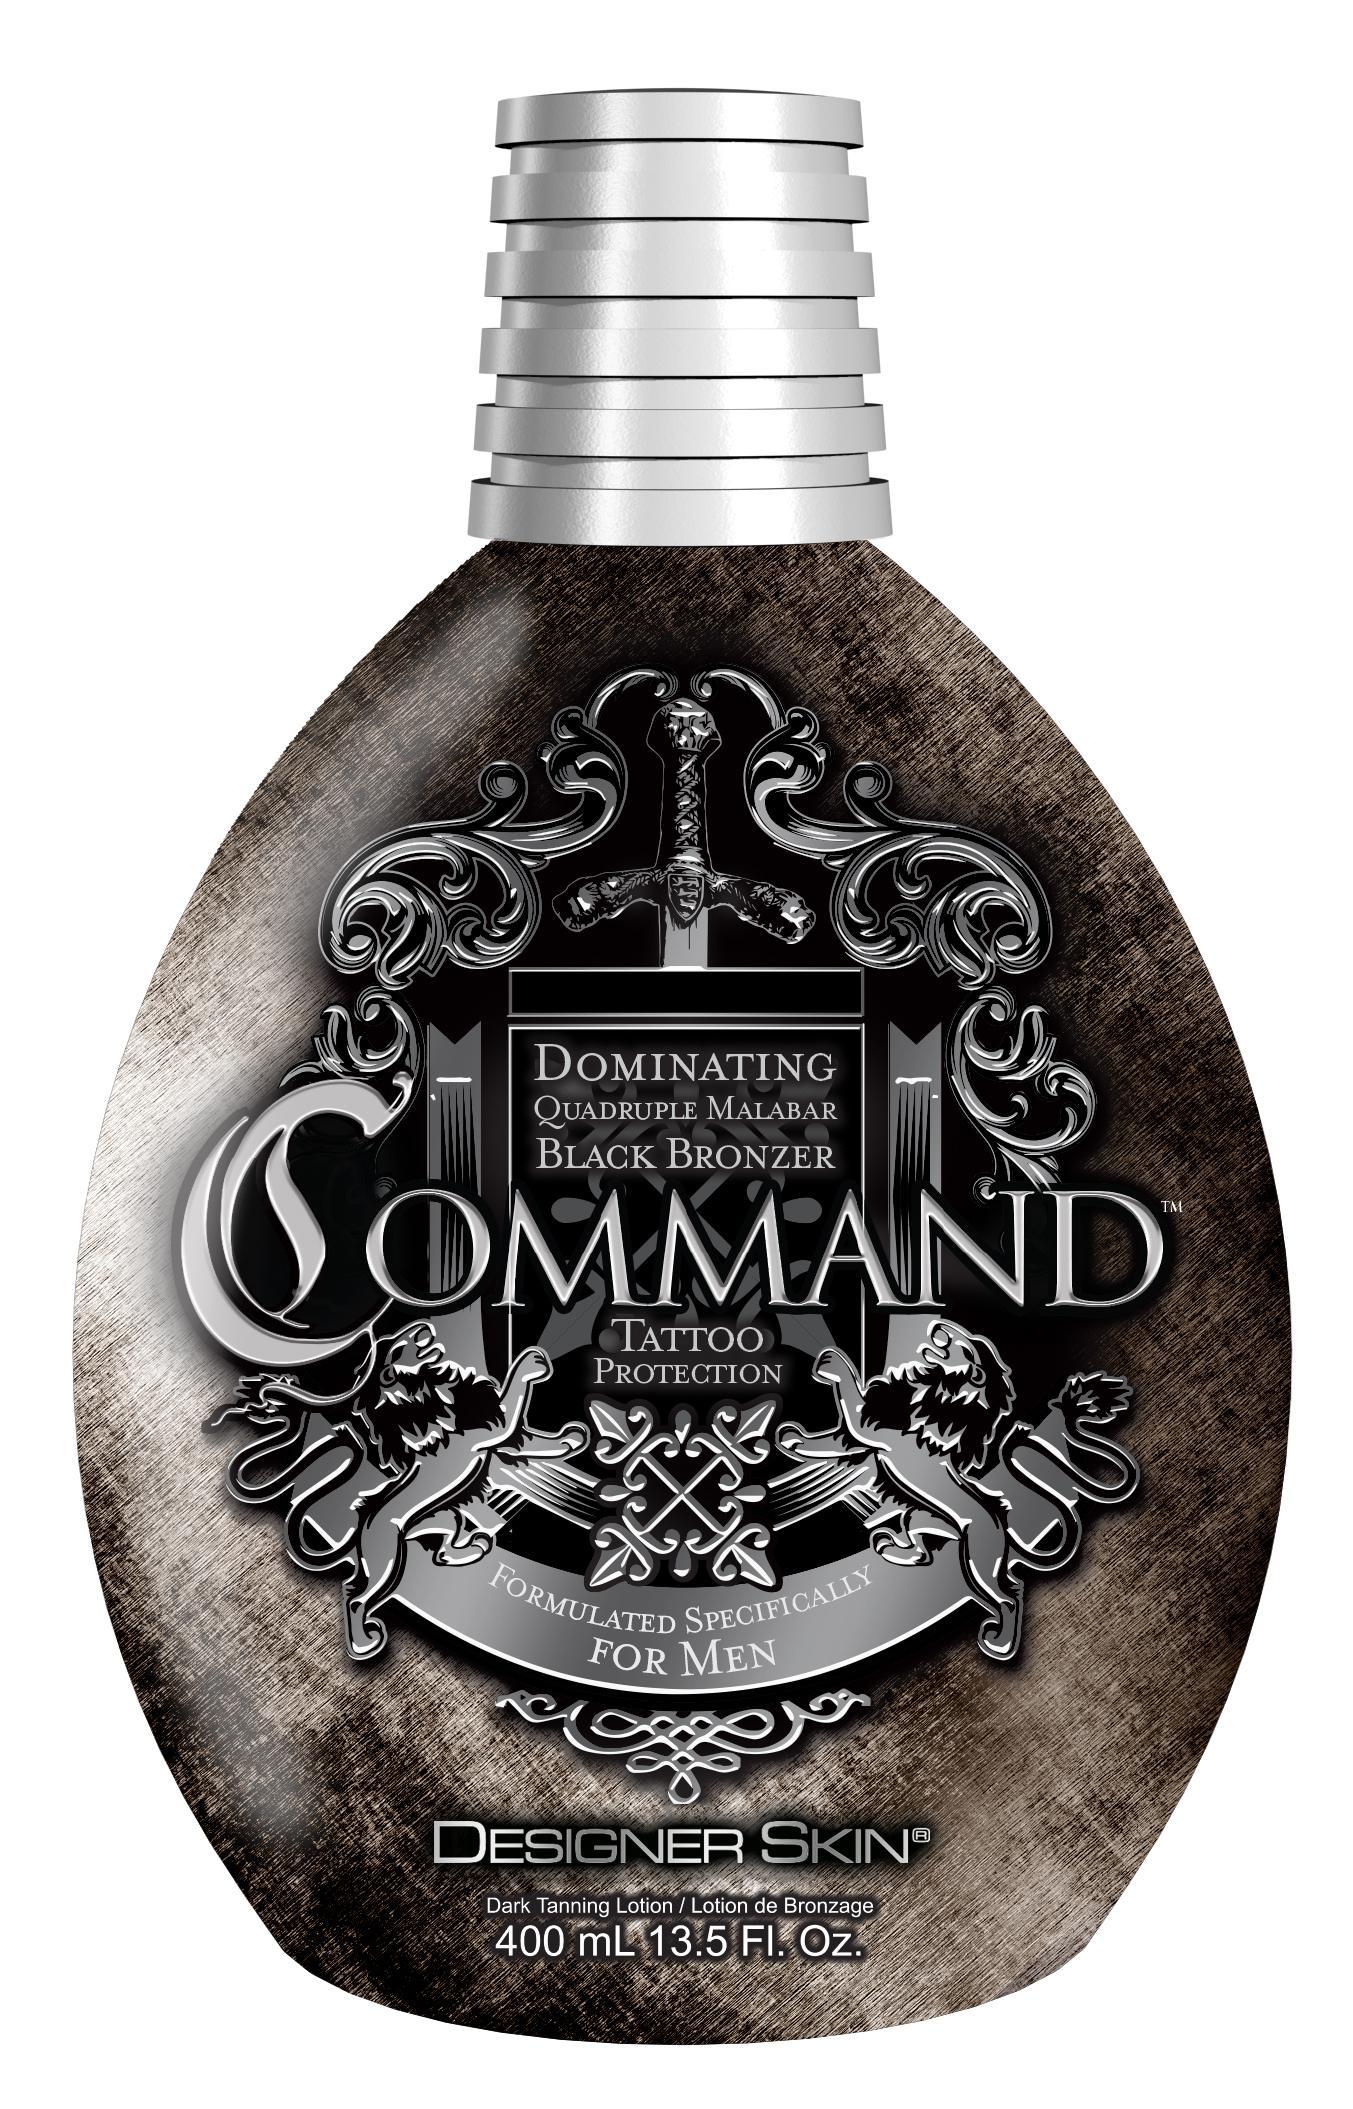 Command™ Dominating Quadruple Malabar Black Bronzer